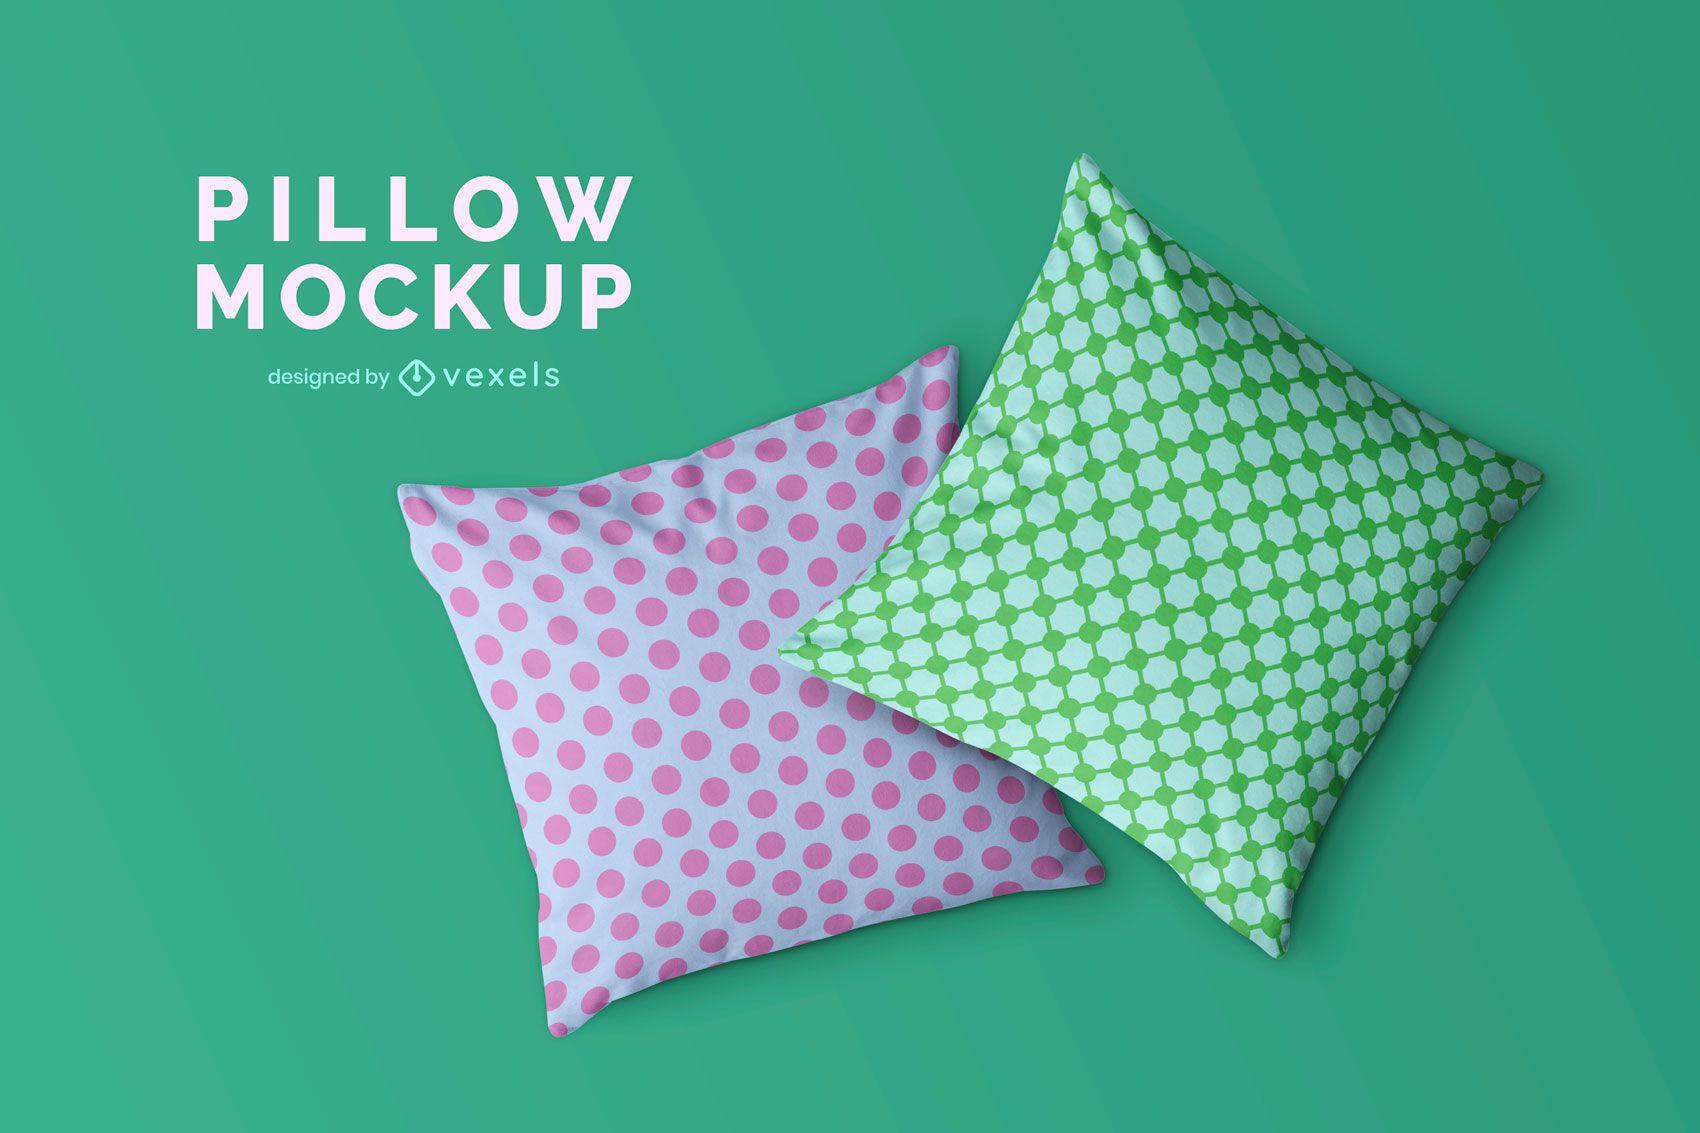 Diseños de maquetas de almohadas